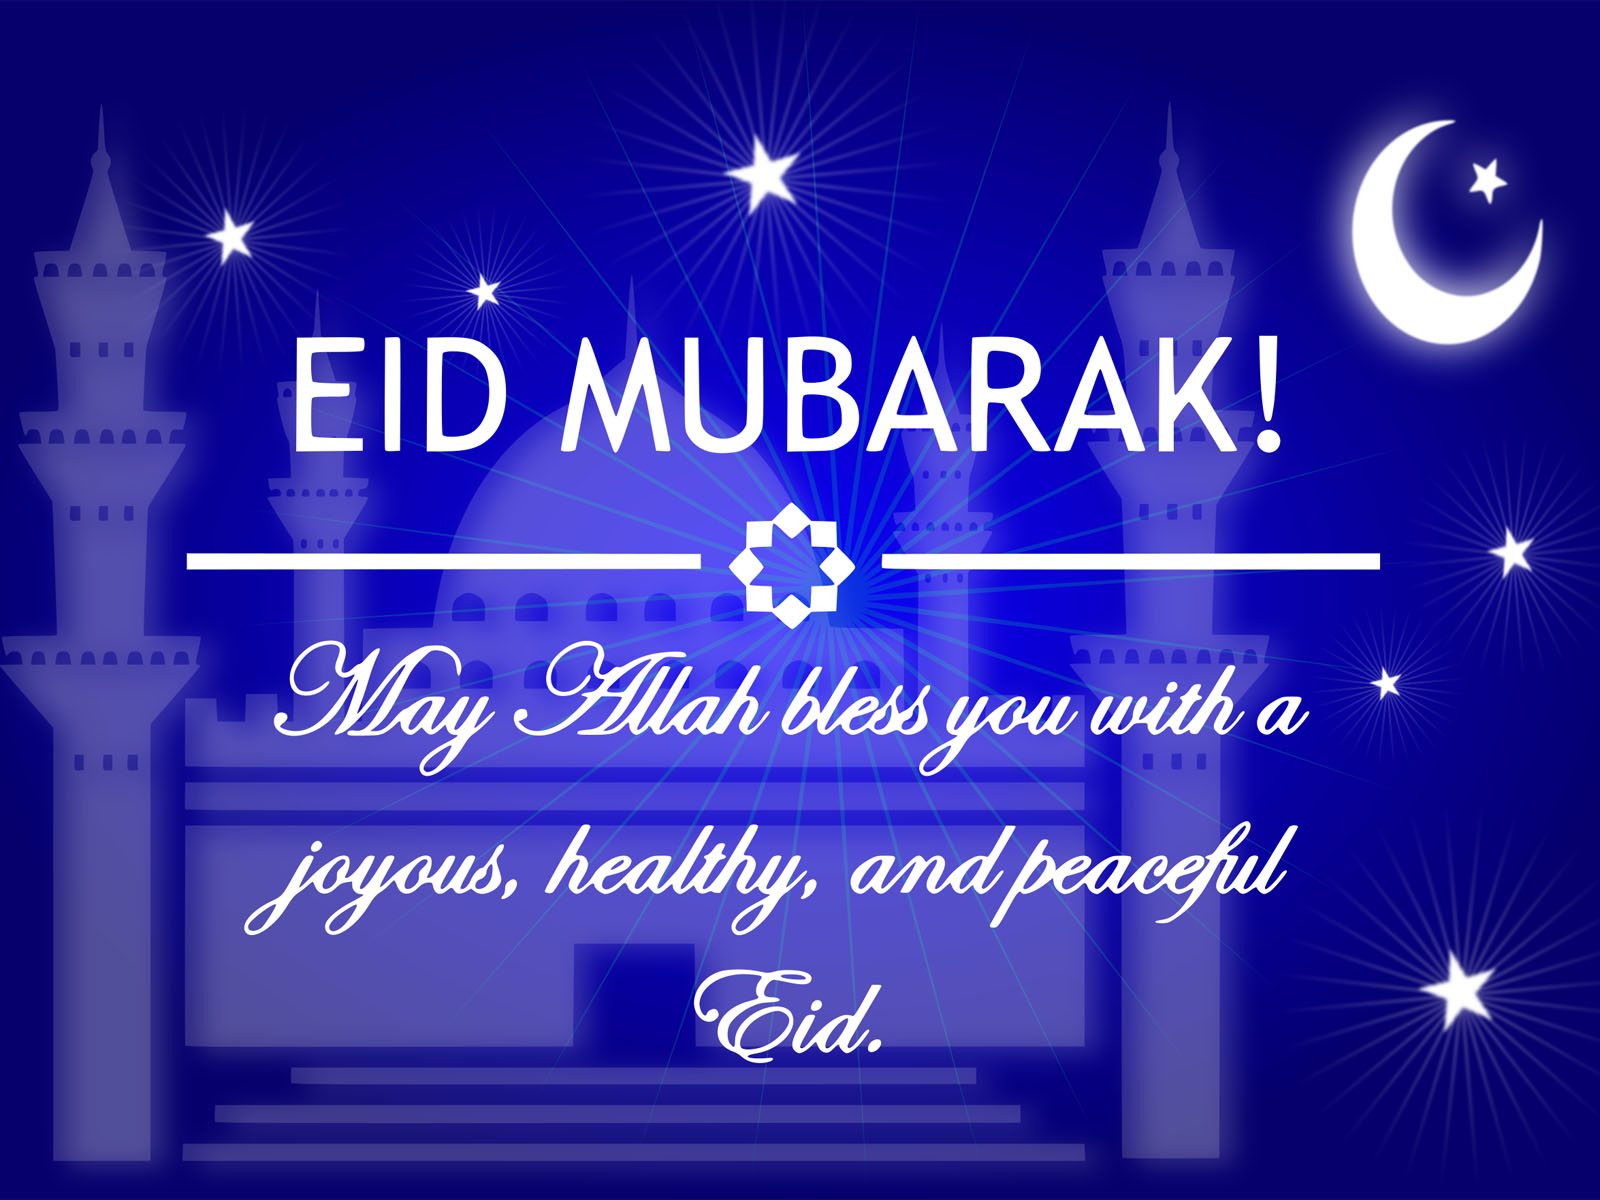 eid mubarak universal greetings backgrounds  religious